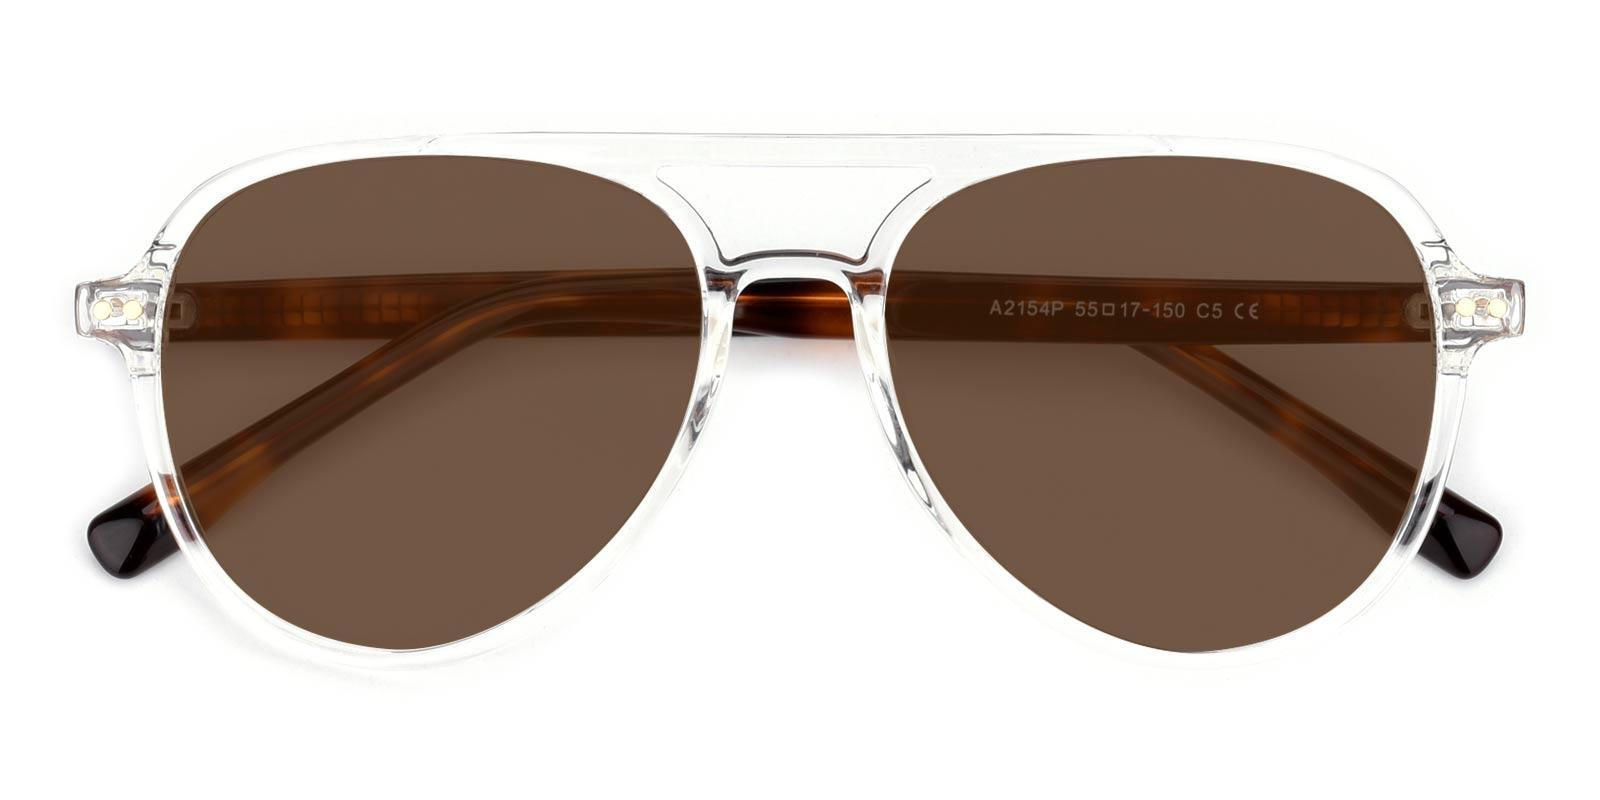 Artists-Tortoise-Aviator-TR-Sunglasses-detail